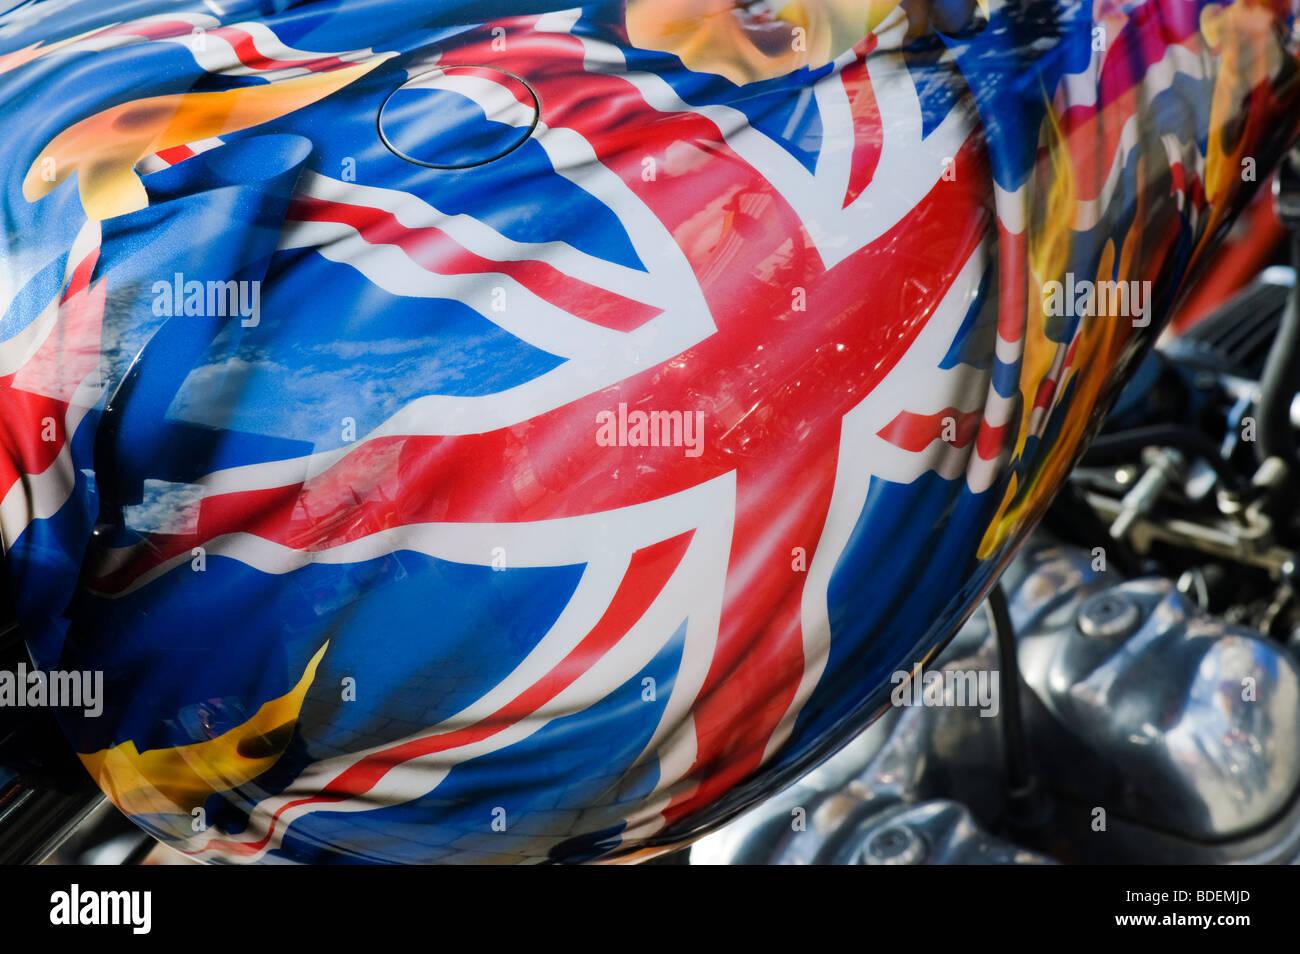 Union Jack fag painted on Custom British Triumph chopper motorcycle - Stock Image